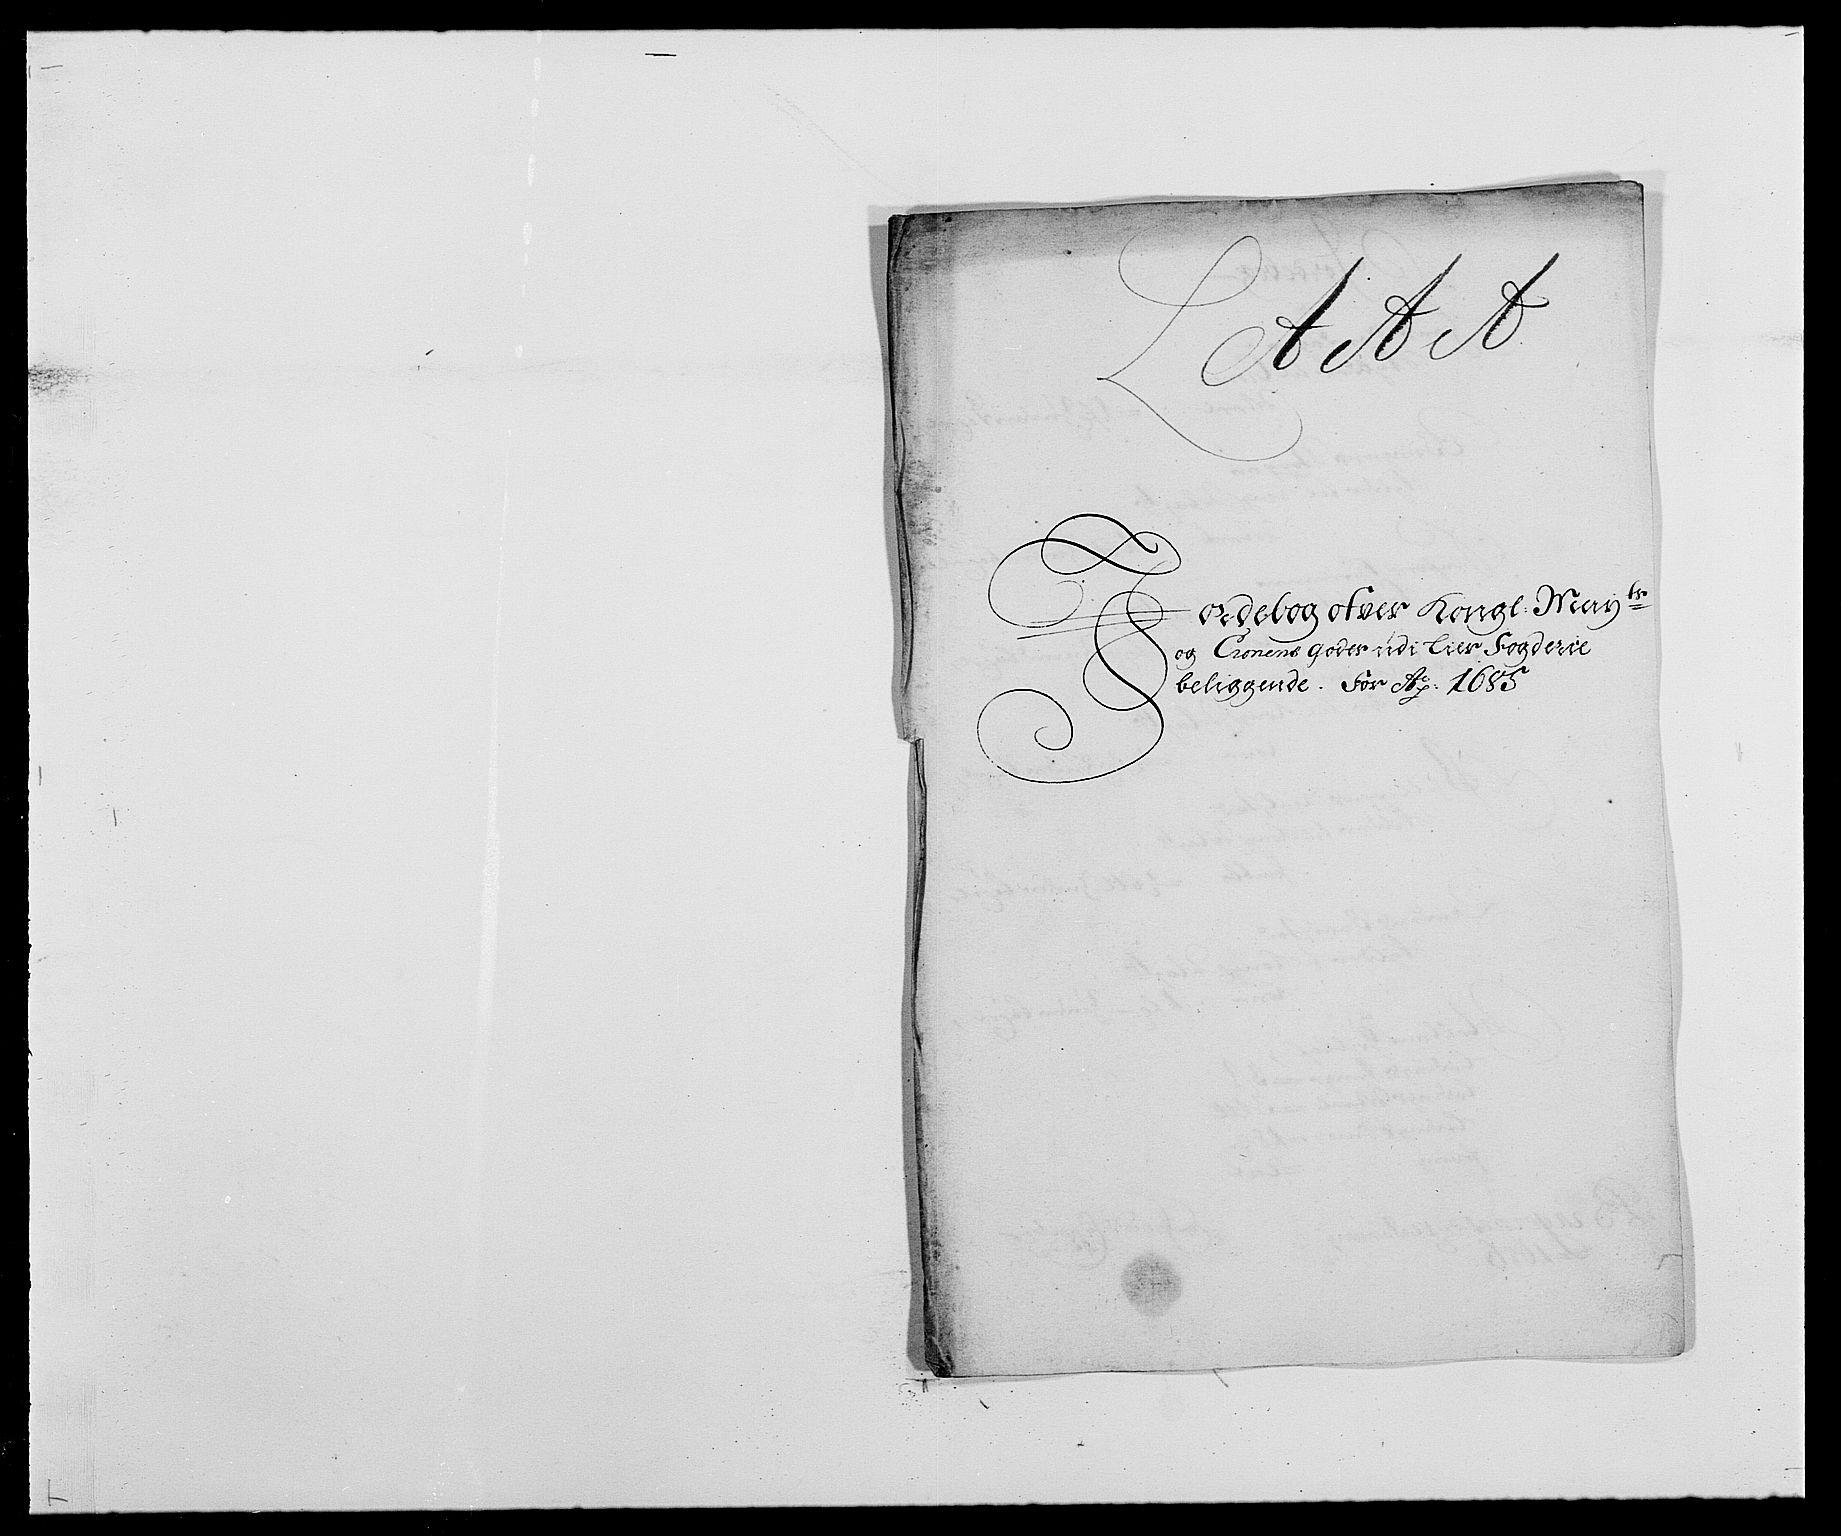 RA, Rentekammeret inntil 1814, Reviderte regnskaper, Fogderegnskap, R27/L1687: Fogderegnskap Lier, 1678-1686, s. 143